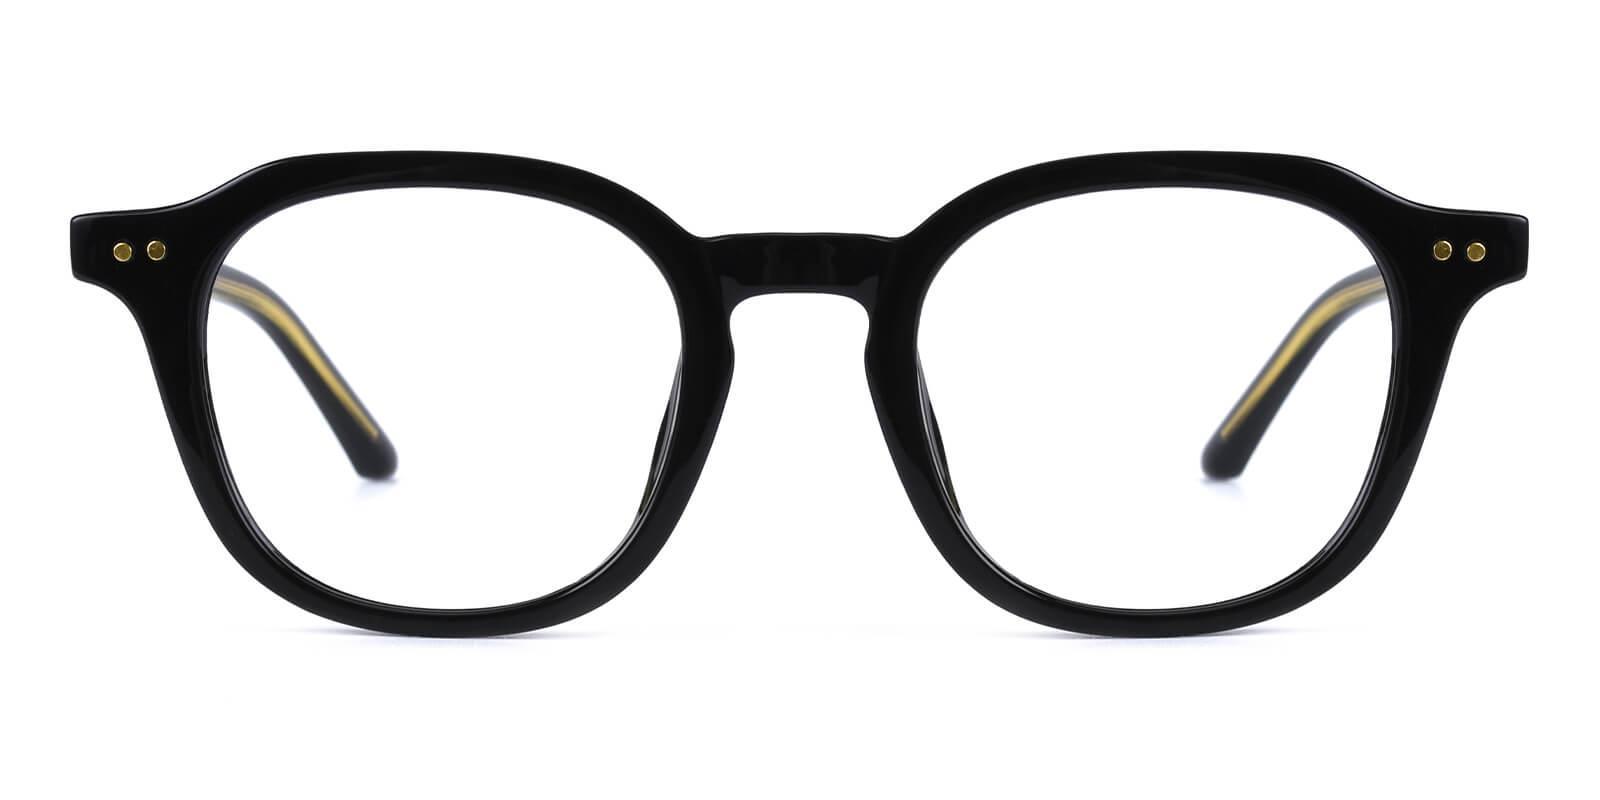 Dapper-Black-Round-Acetate-Eyeglasses-detail